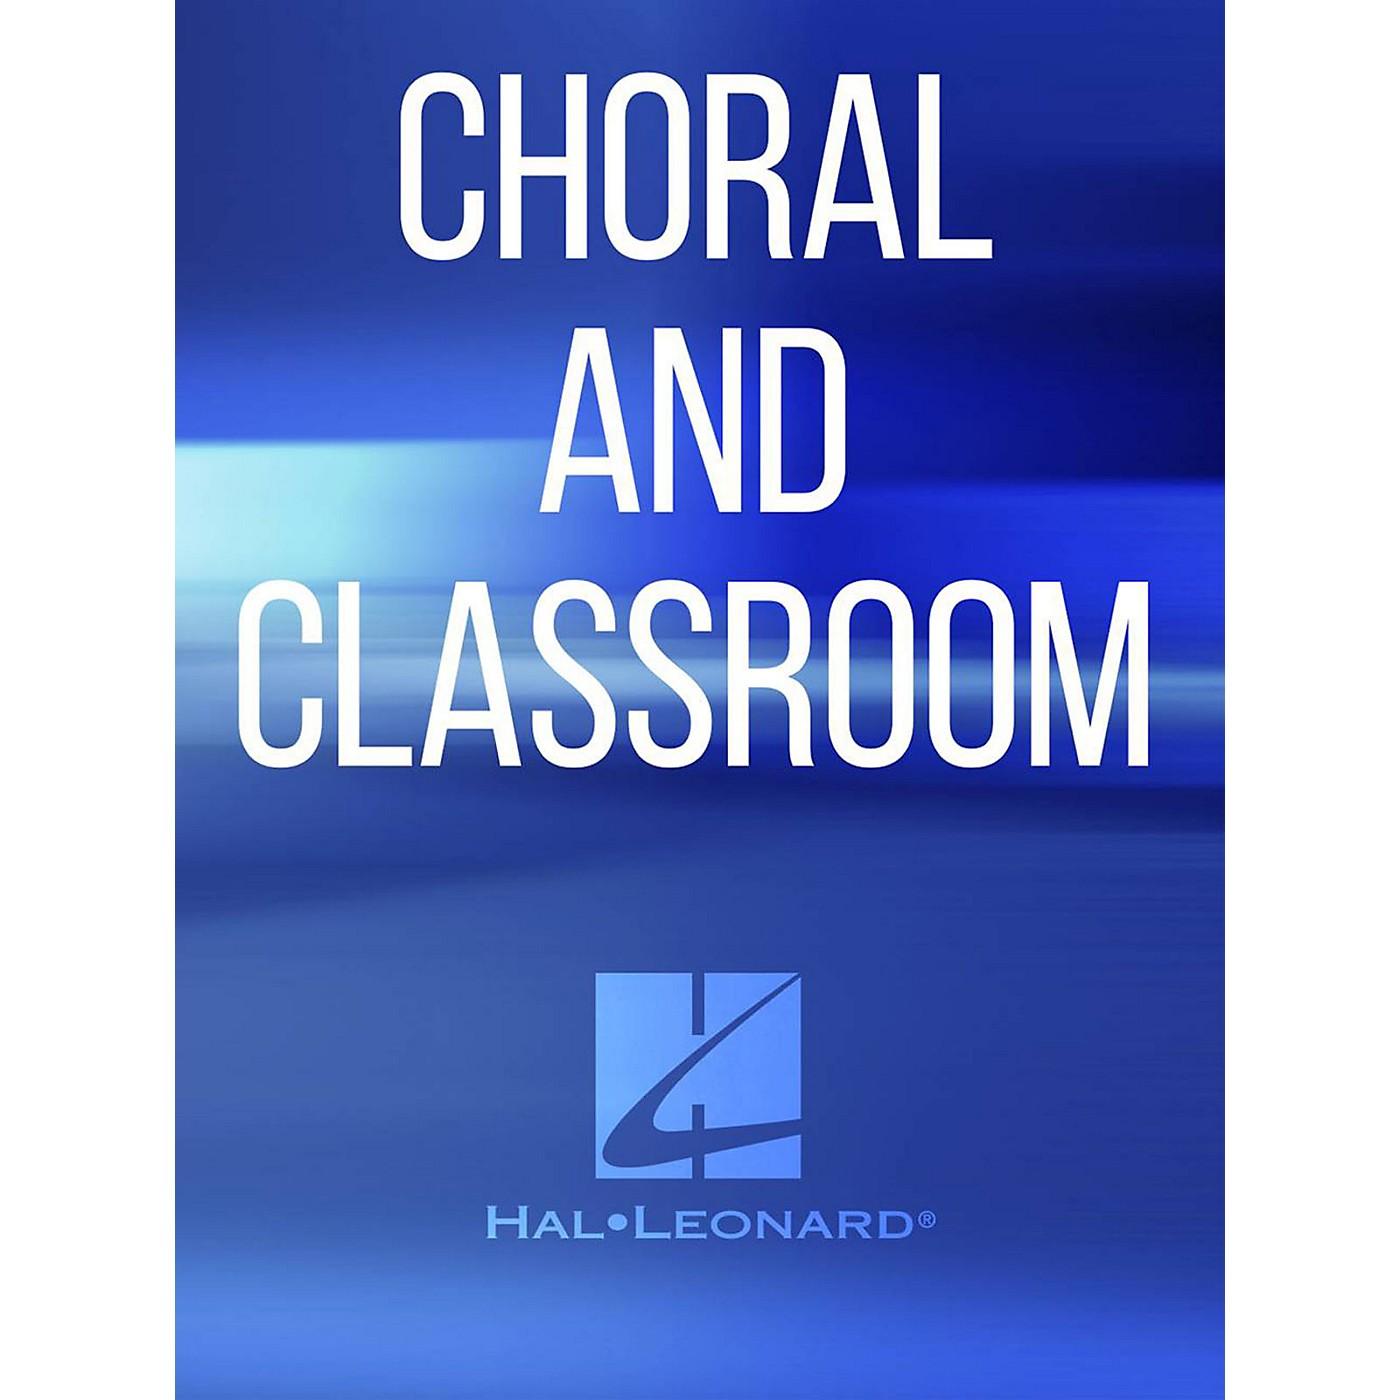 Hal Leonard Christmas Suite For Organ Organ Composed by Thomas Schmutzler thumbnail